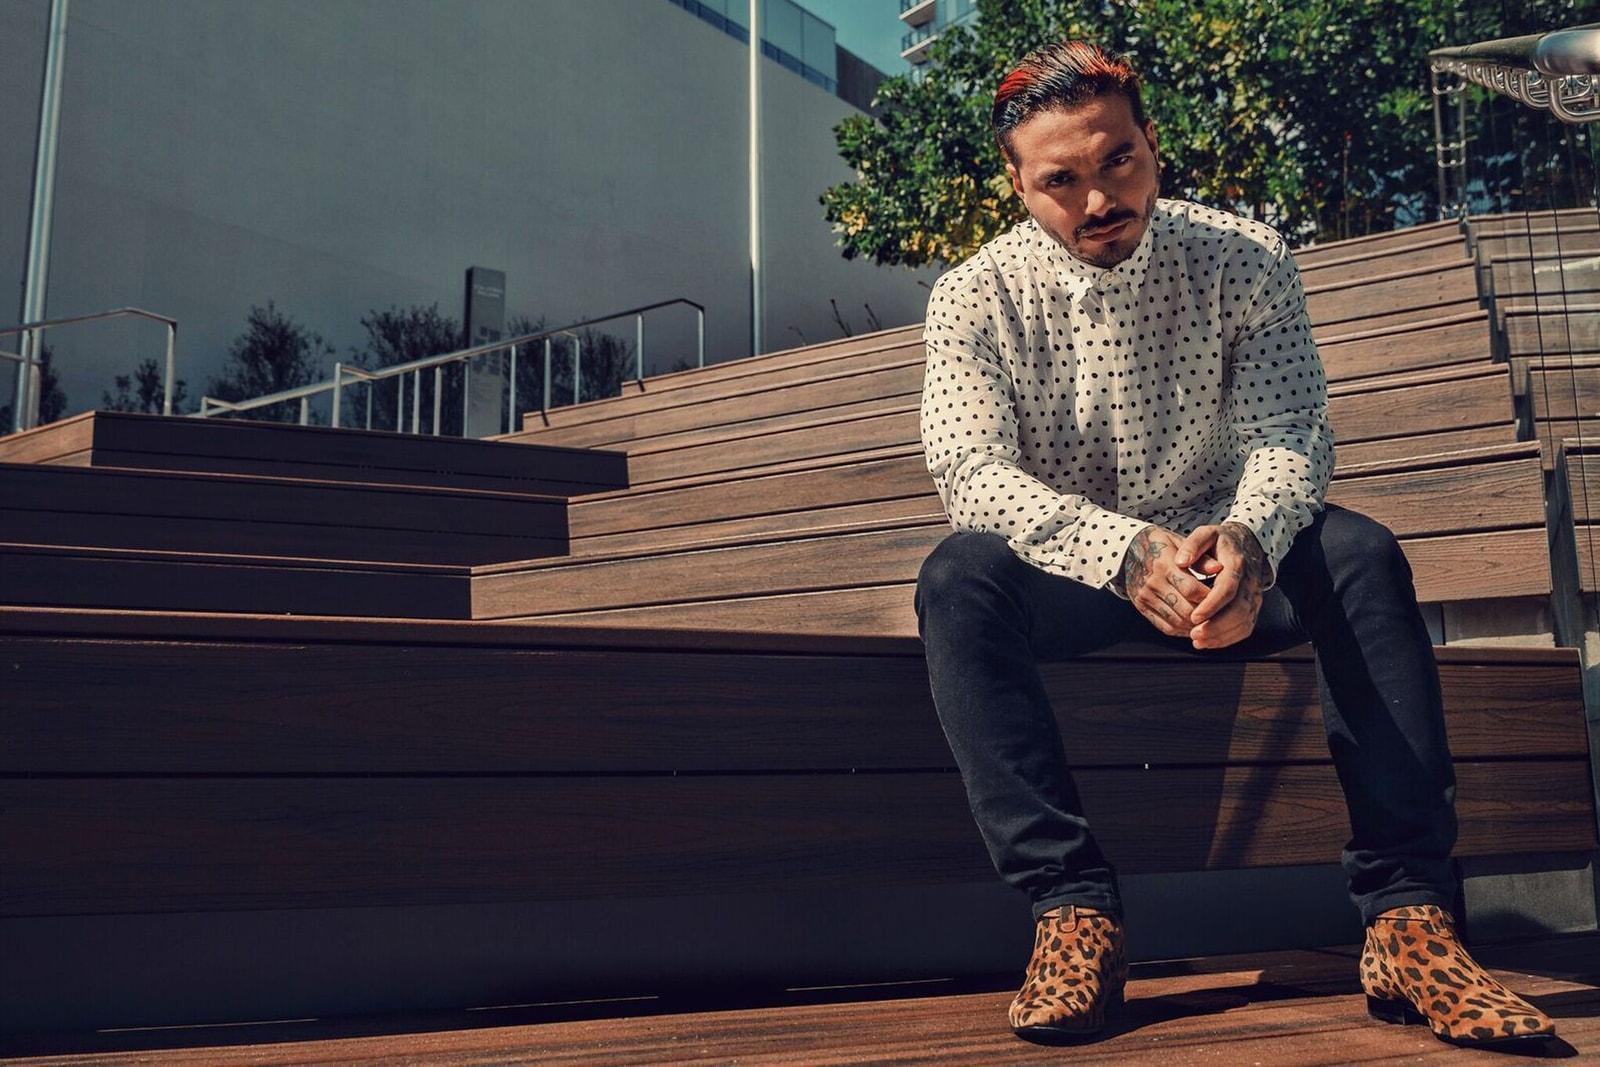 J Balvin HYPEBEAST Interview 2017 Supreme BAPE Migos Pharrell Daddy Yankee Reggaeton Sneakerheads